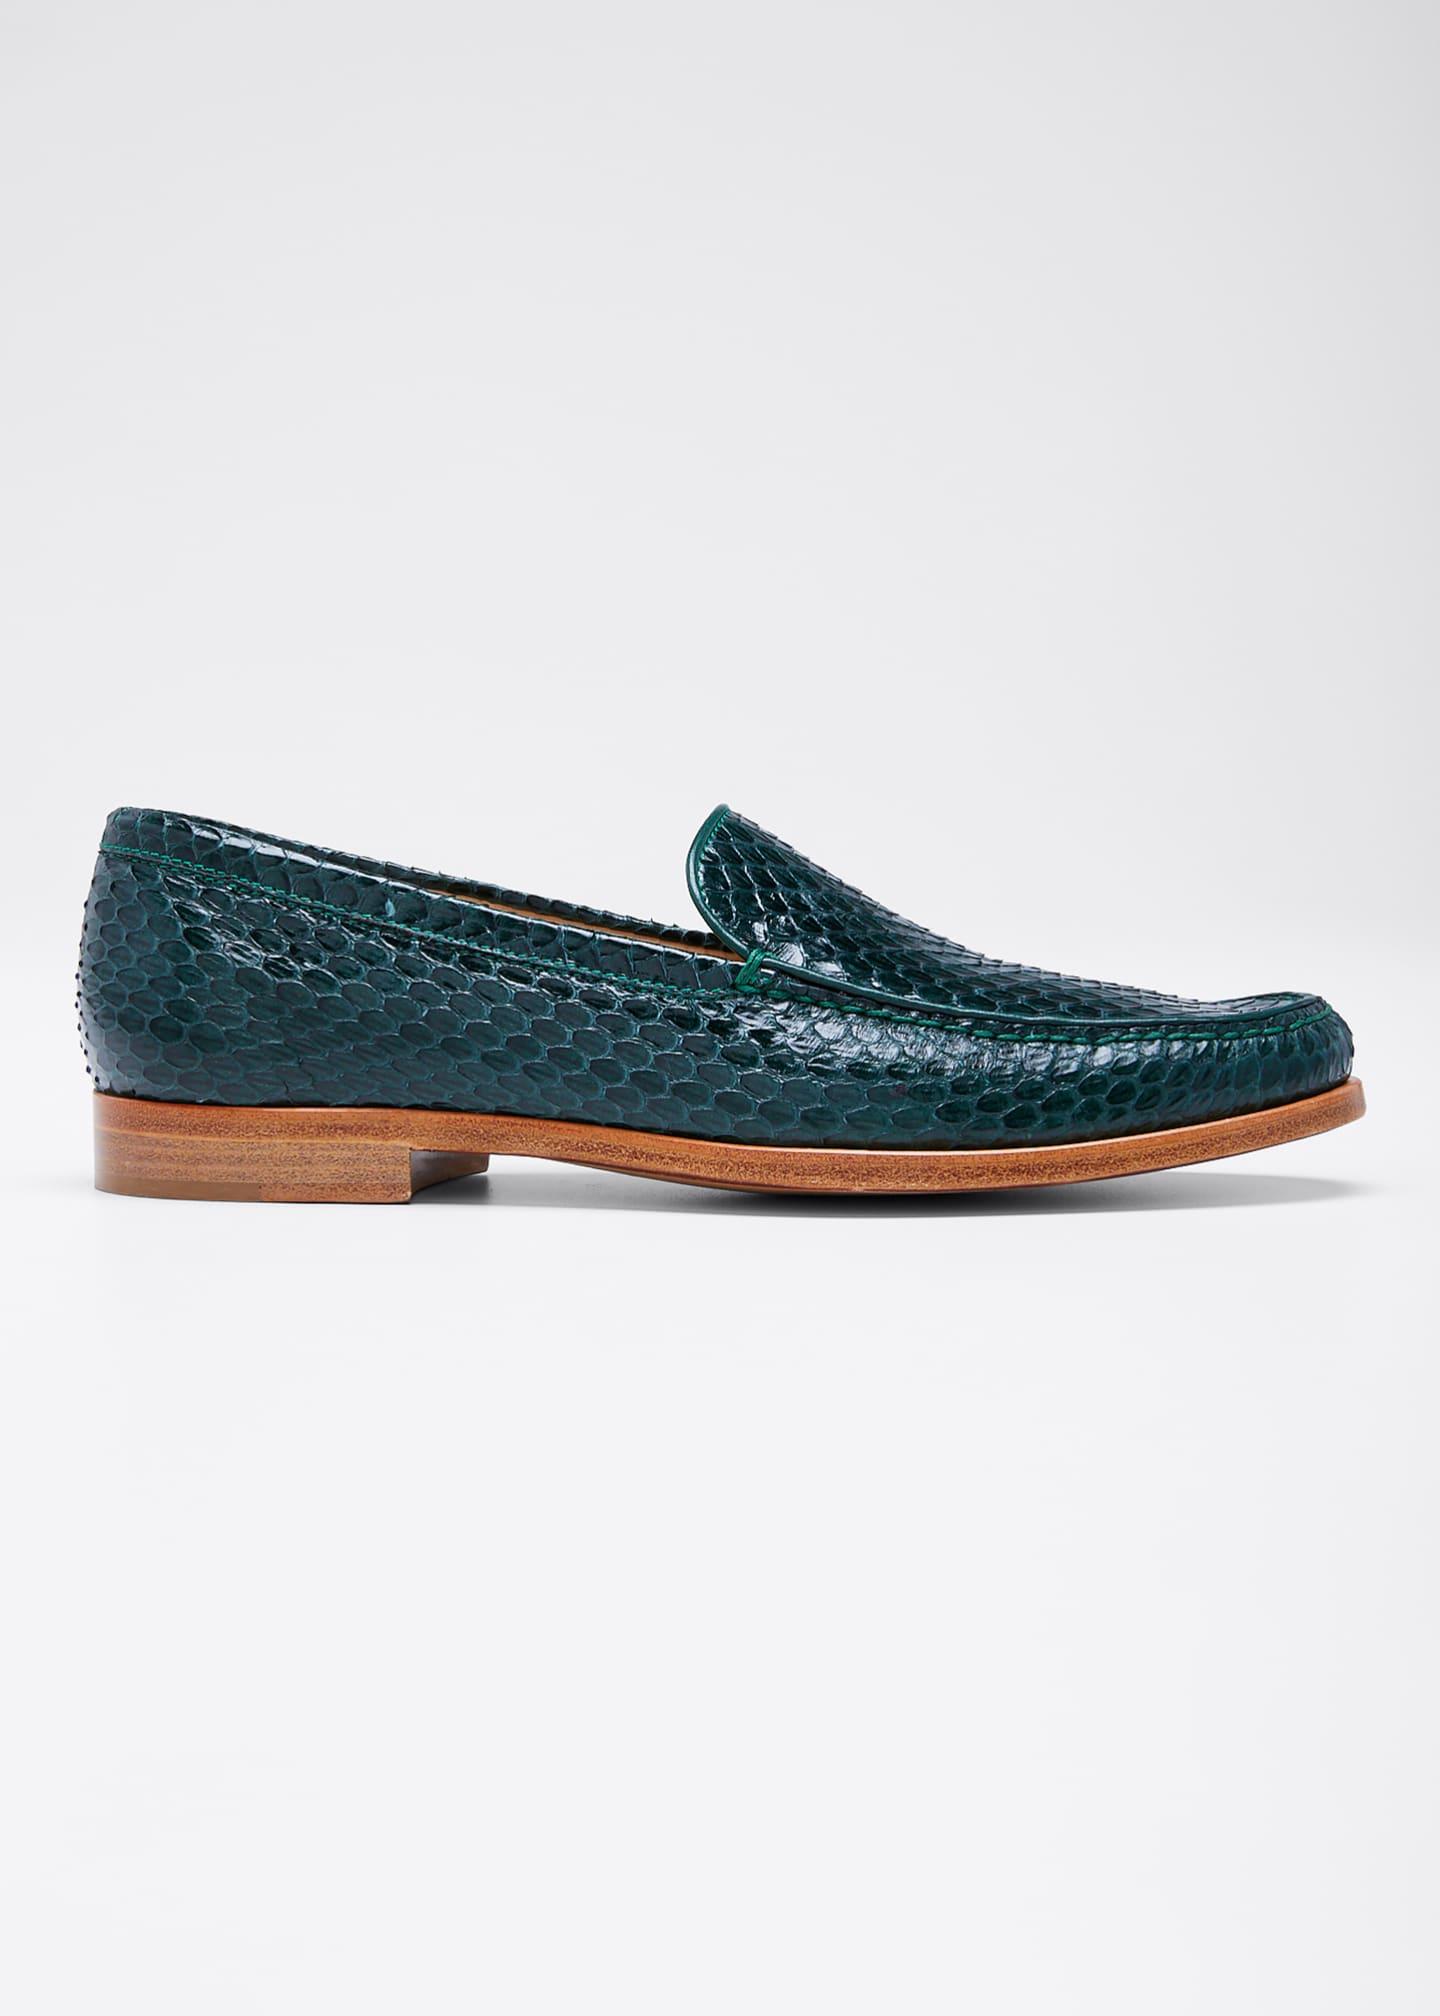 Gabriela Hearst Renault Snakeskin Loafers